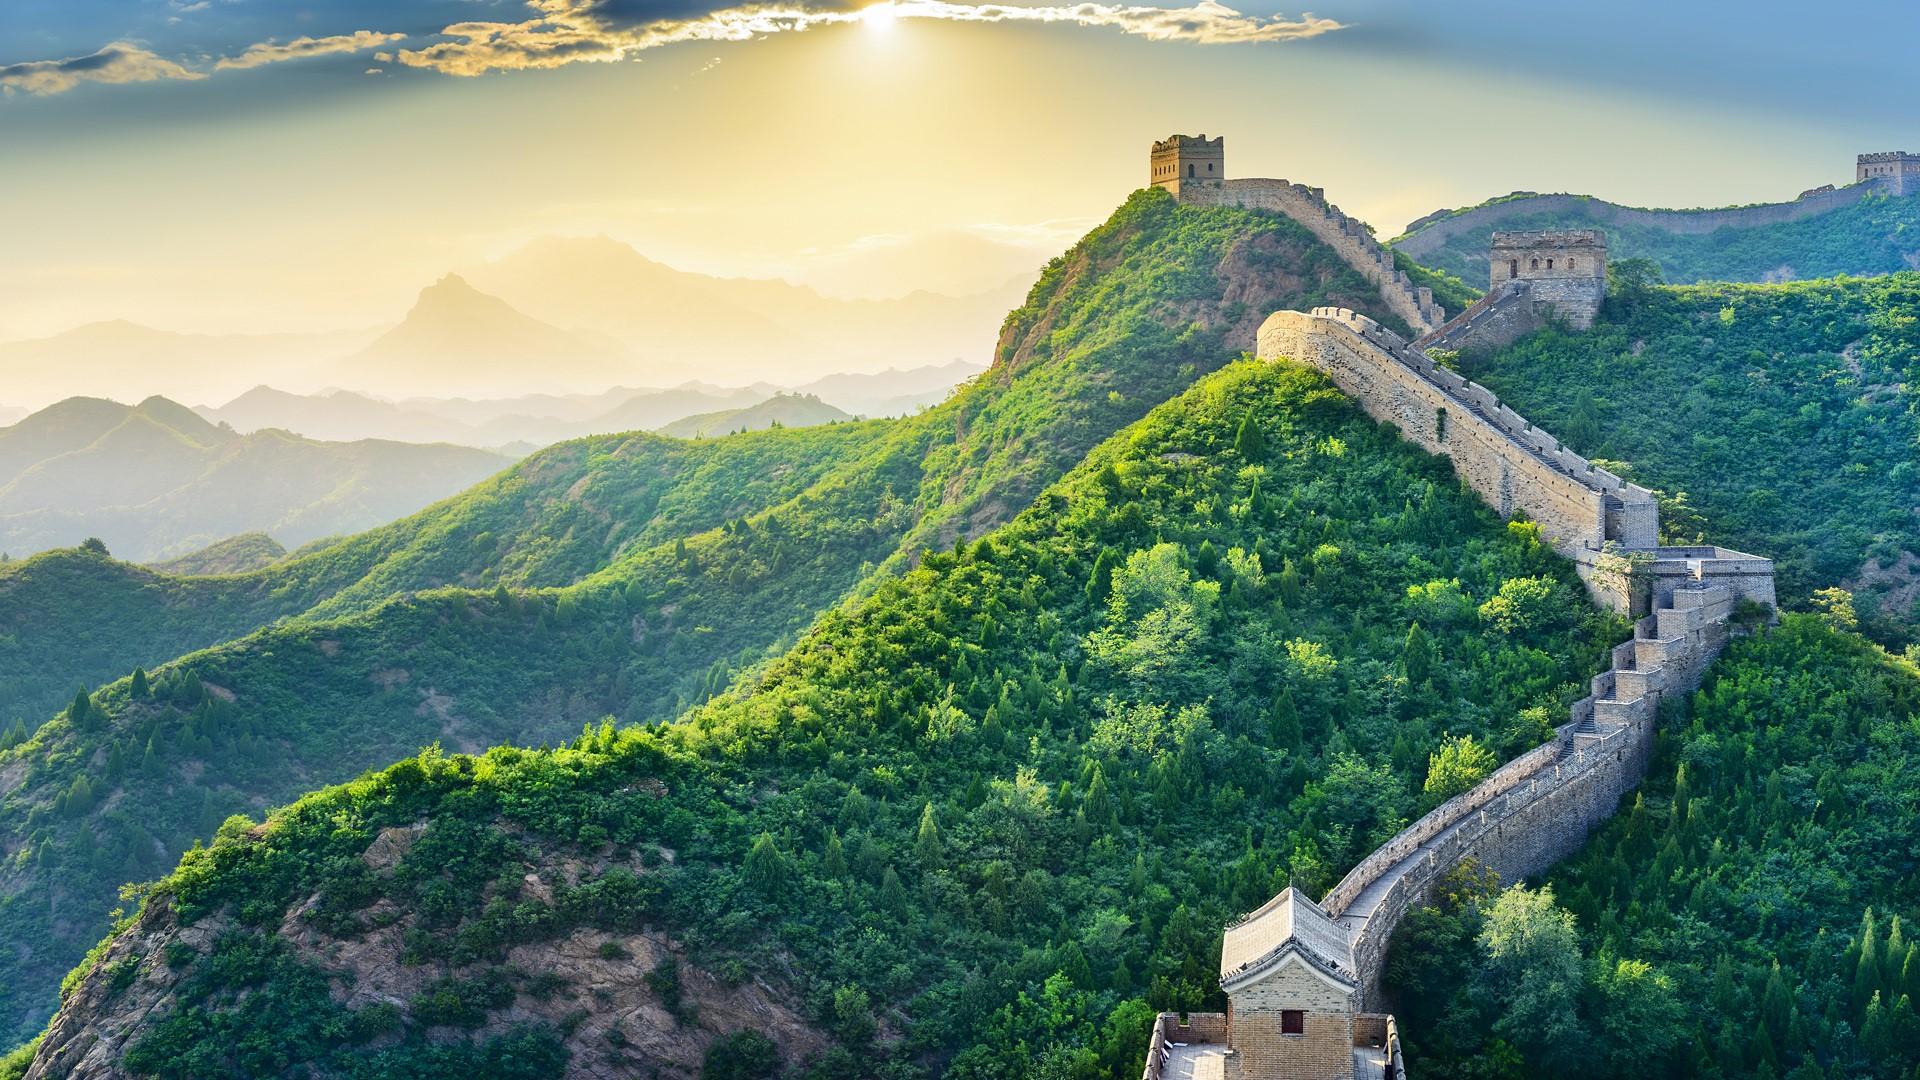 The Great Wall of China Beijing Huairou District Windows 10 1920x1080